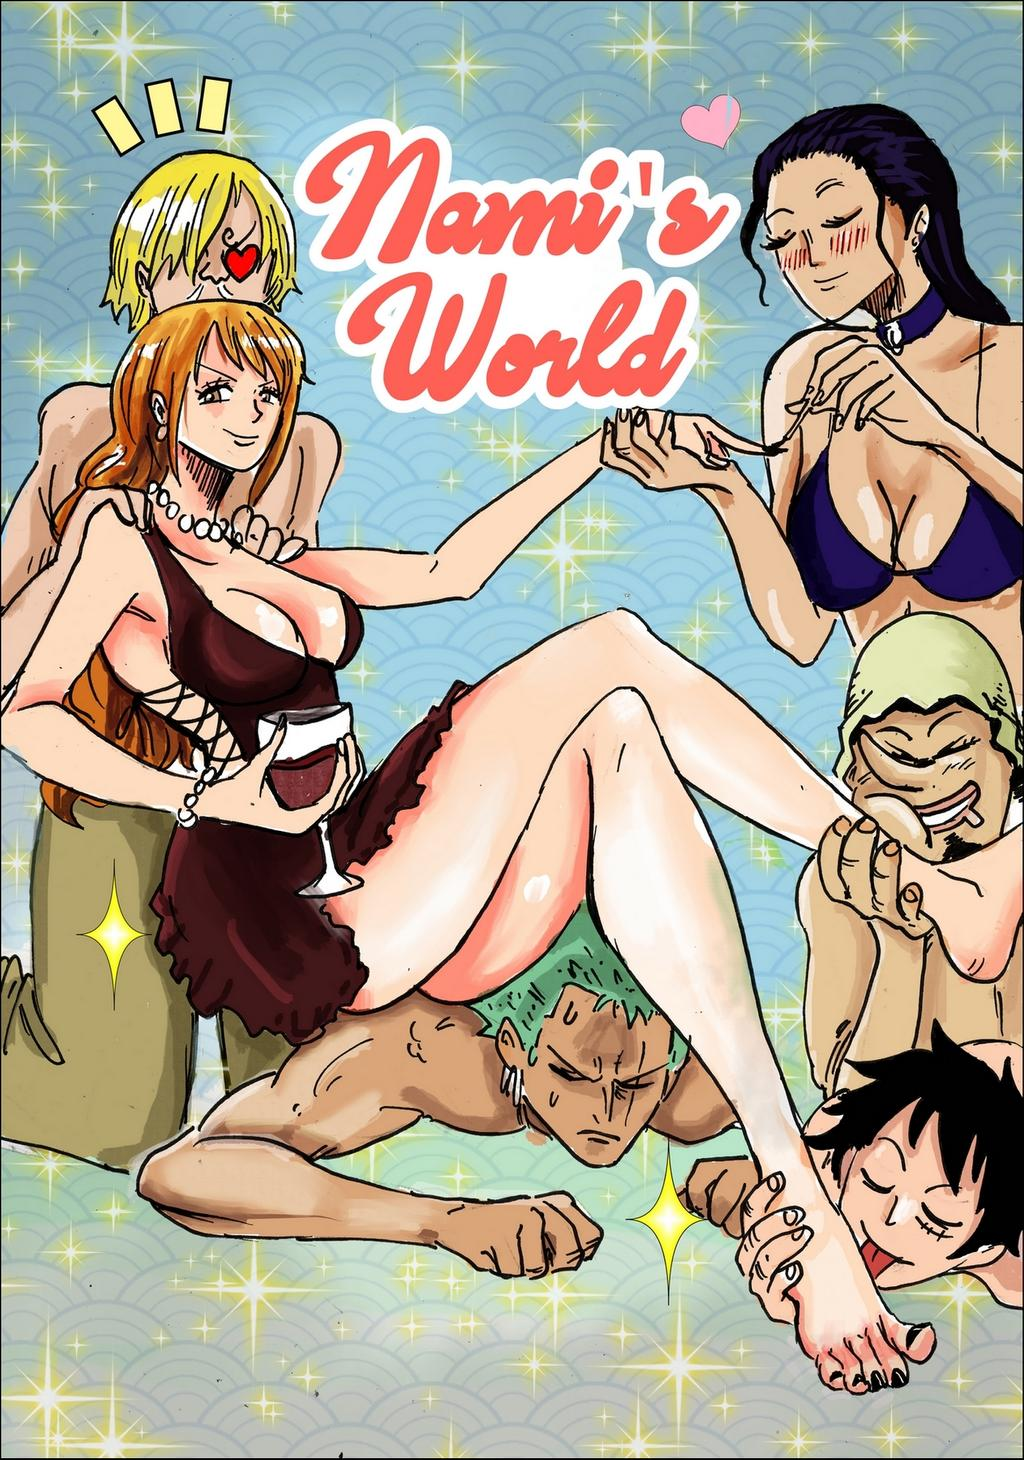 comic__nami_s_world_by_sssslavein_dd1o1wk-fullview.jpg